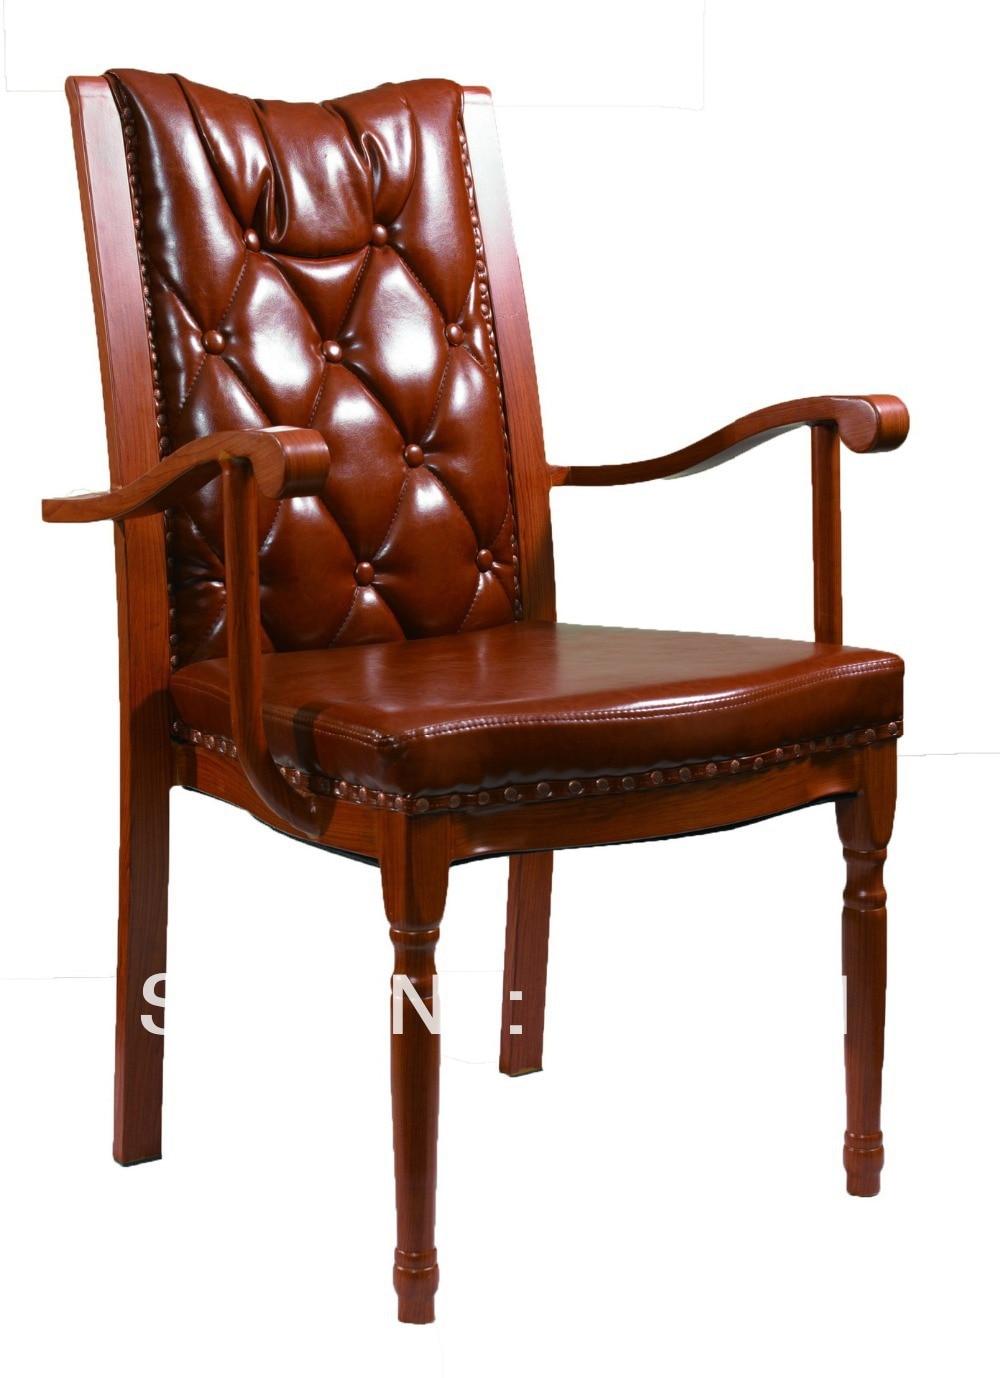 Stackable wood imitation luxury Aluminum Dining Armchair,heavy duty fabric with high rub resistance,comfortableStackable wood imitation luxury Aluminum Dining Armchair,heavy duty fabric with high rub resistance,comfortable